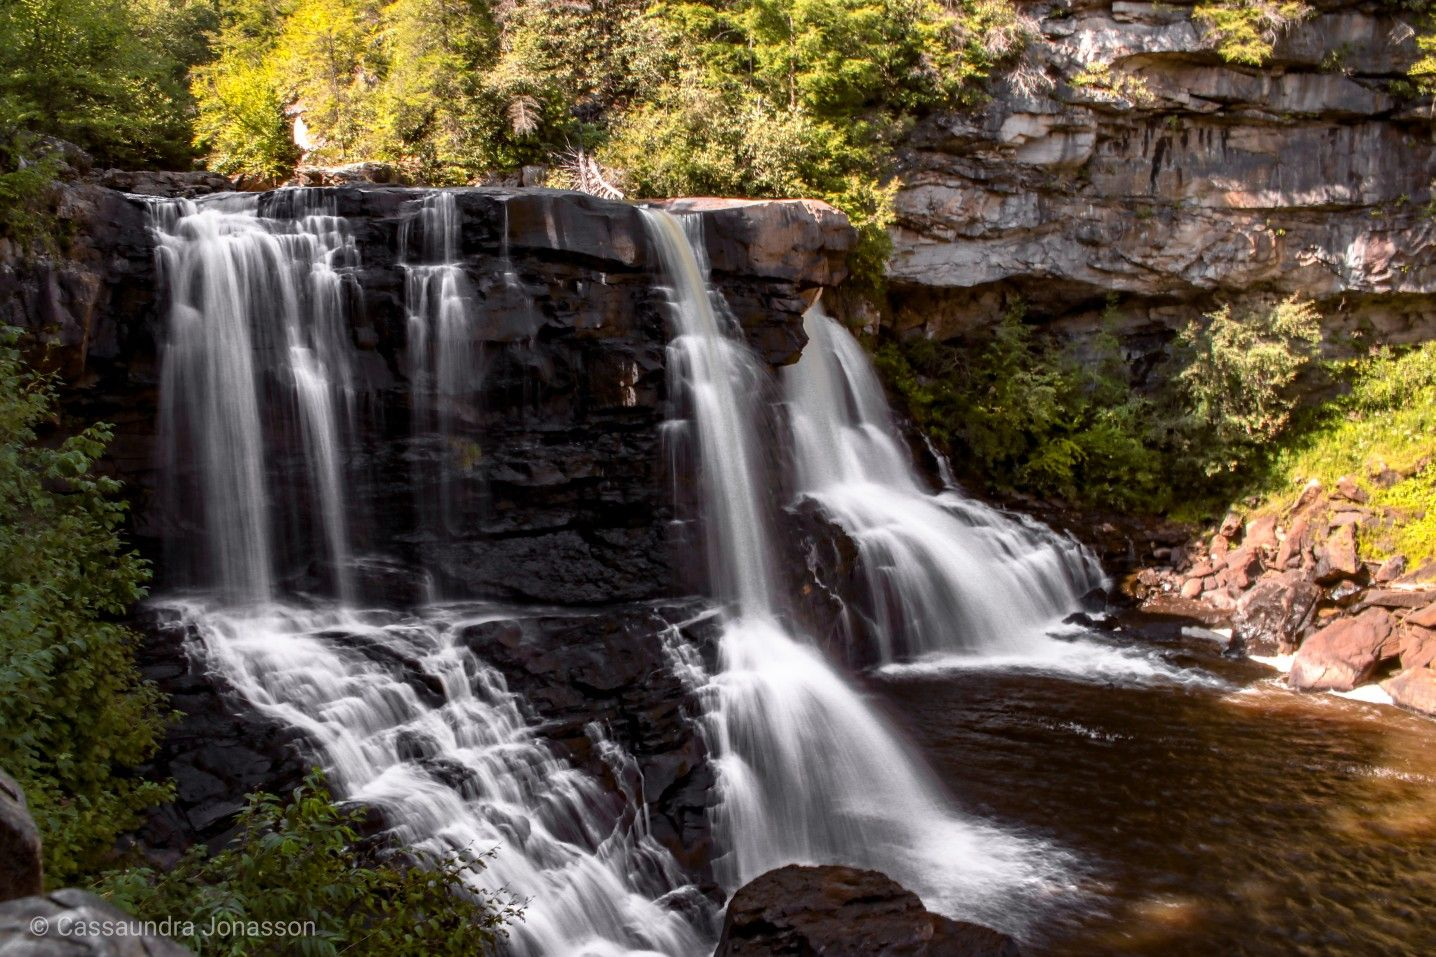 Chasing waterfalls at West Virginias Blackwater Falls